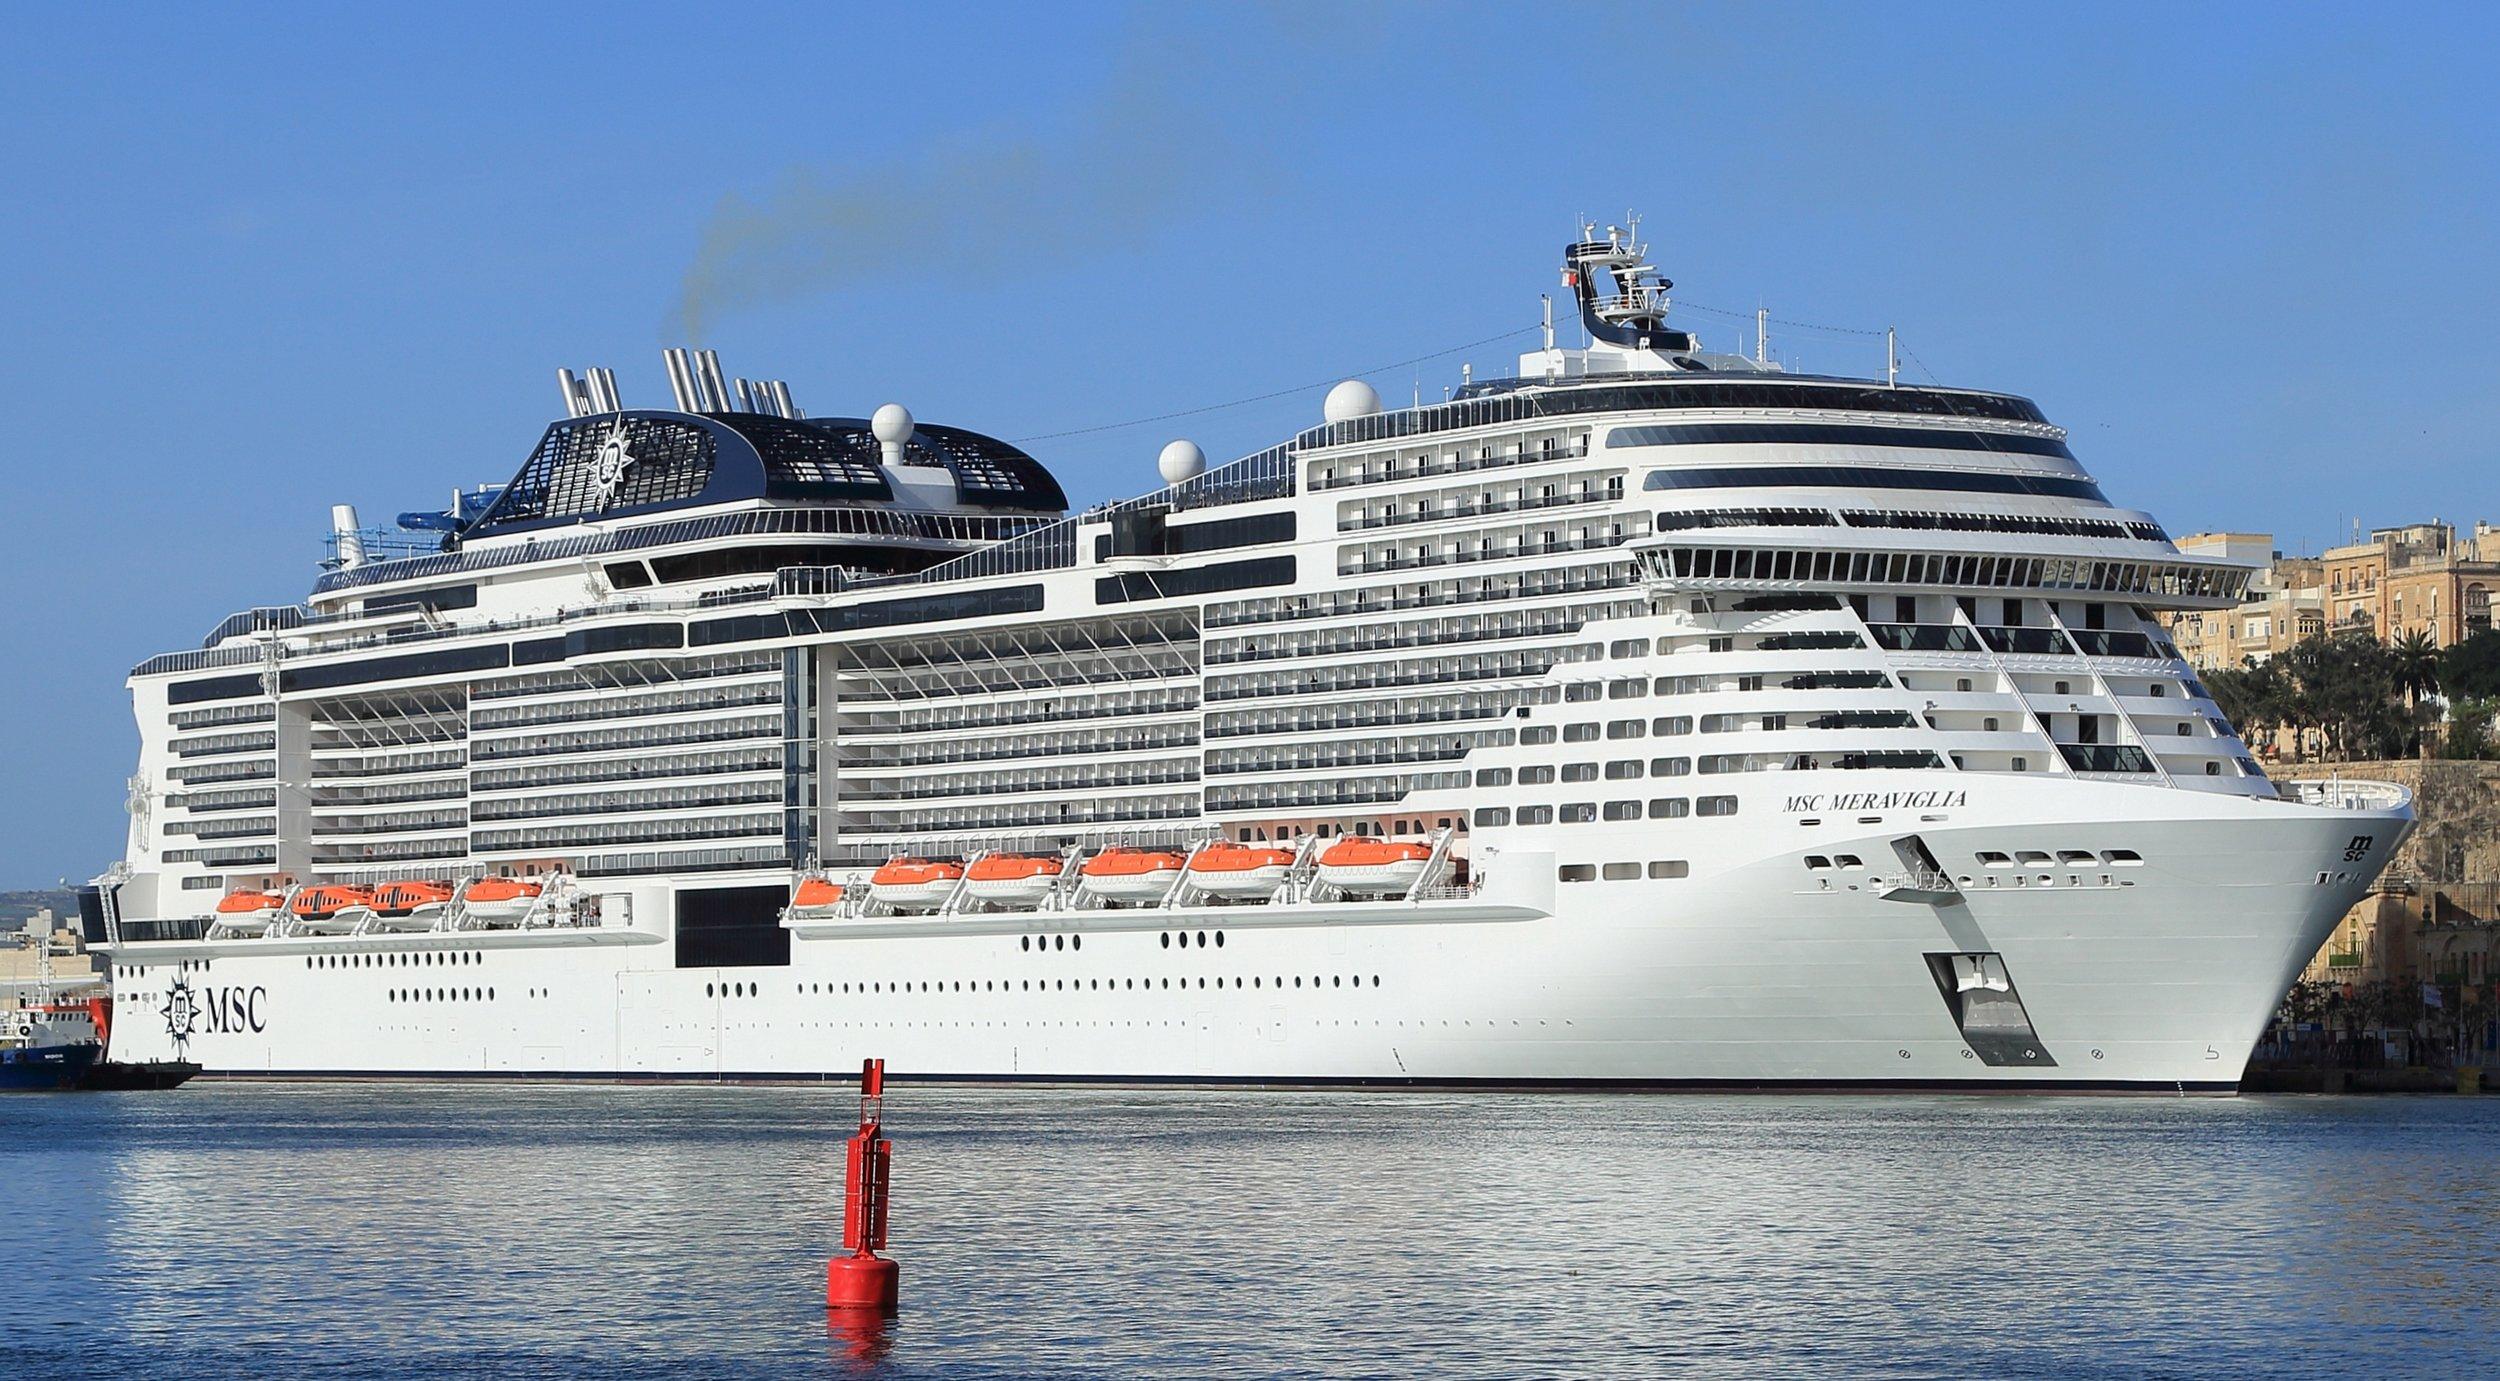 MSC_Meraviglia_Grand_Harbour_Malta_20180307_03_(cropped).jpg